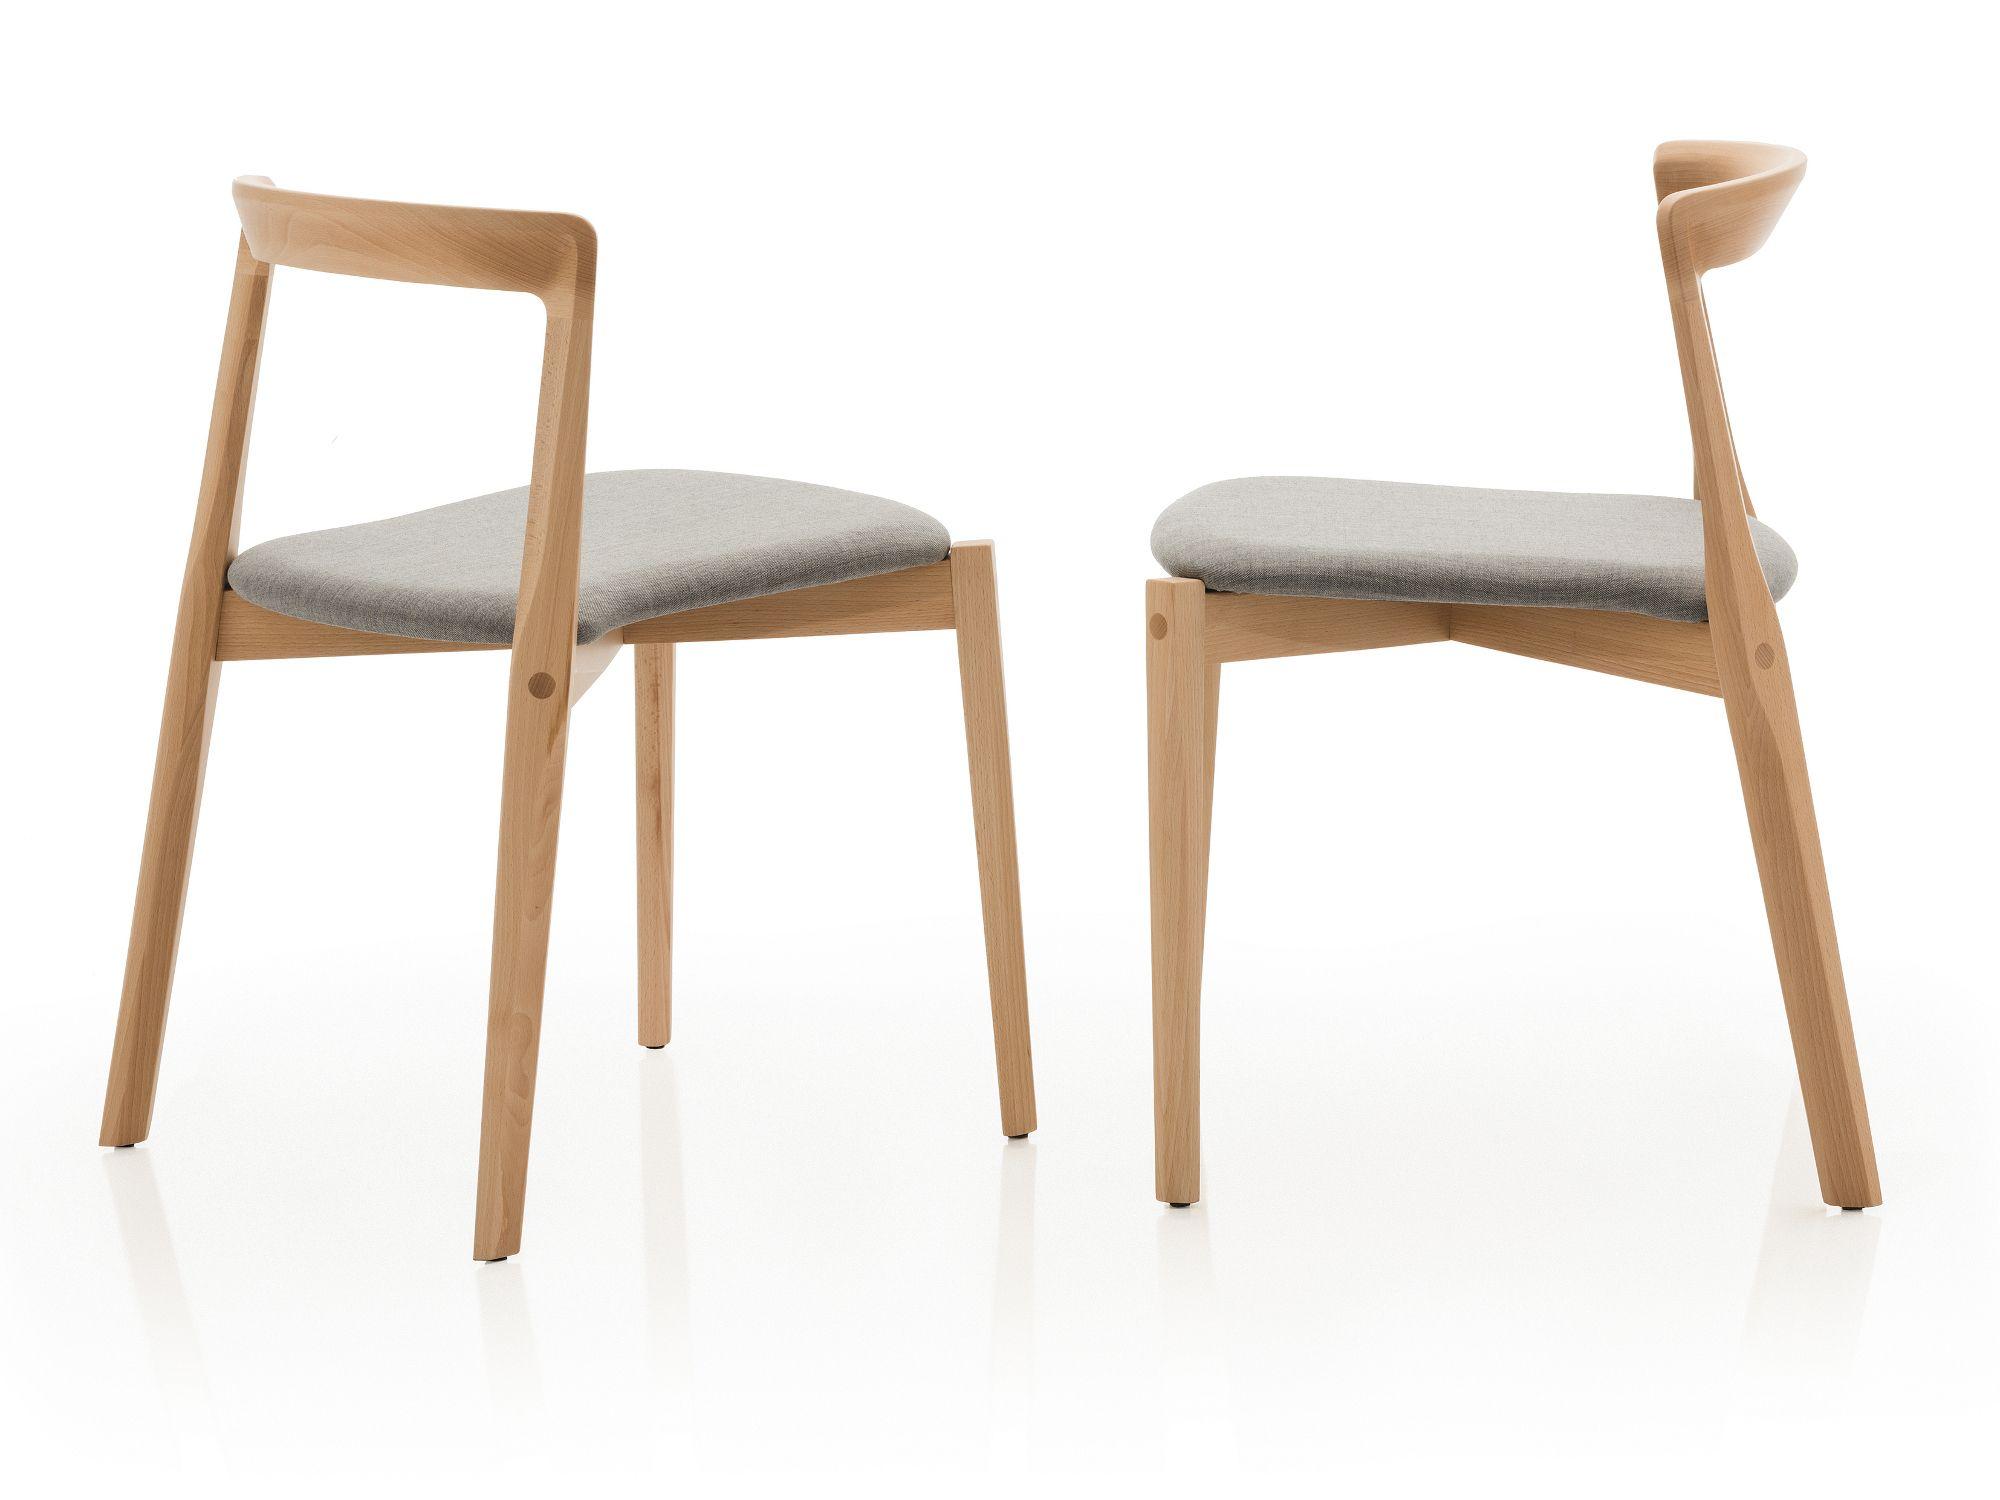 Stackable Wooden Chairs stackable wooden chair helixb-line design favaretto&partners